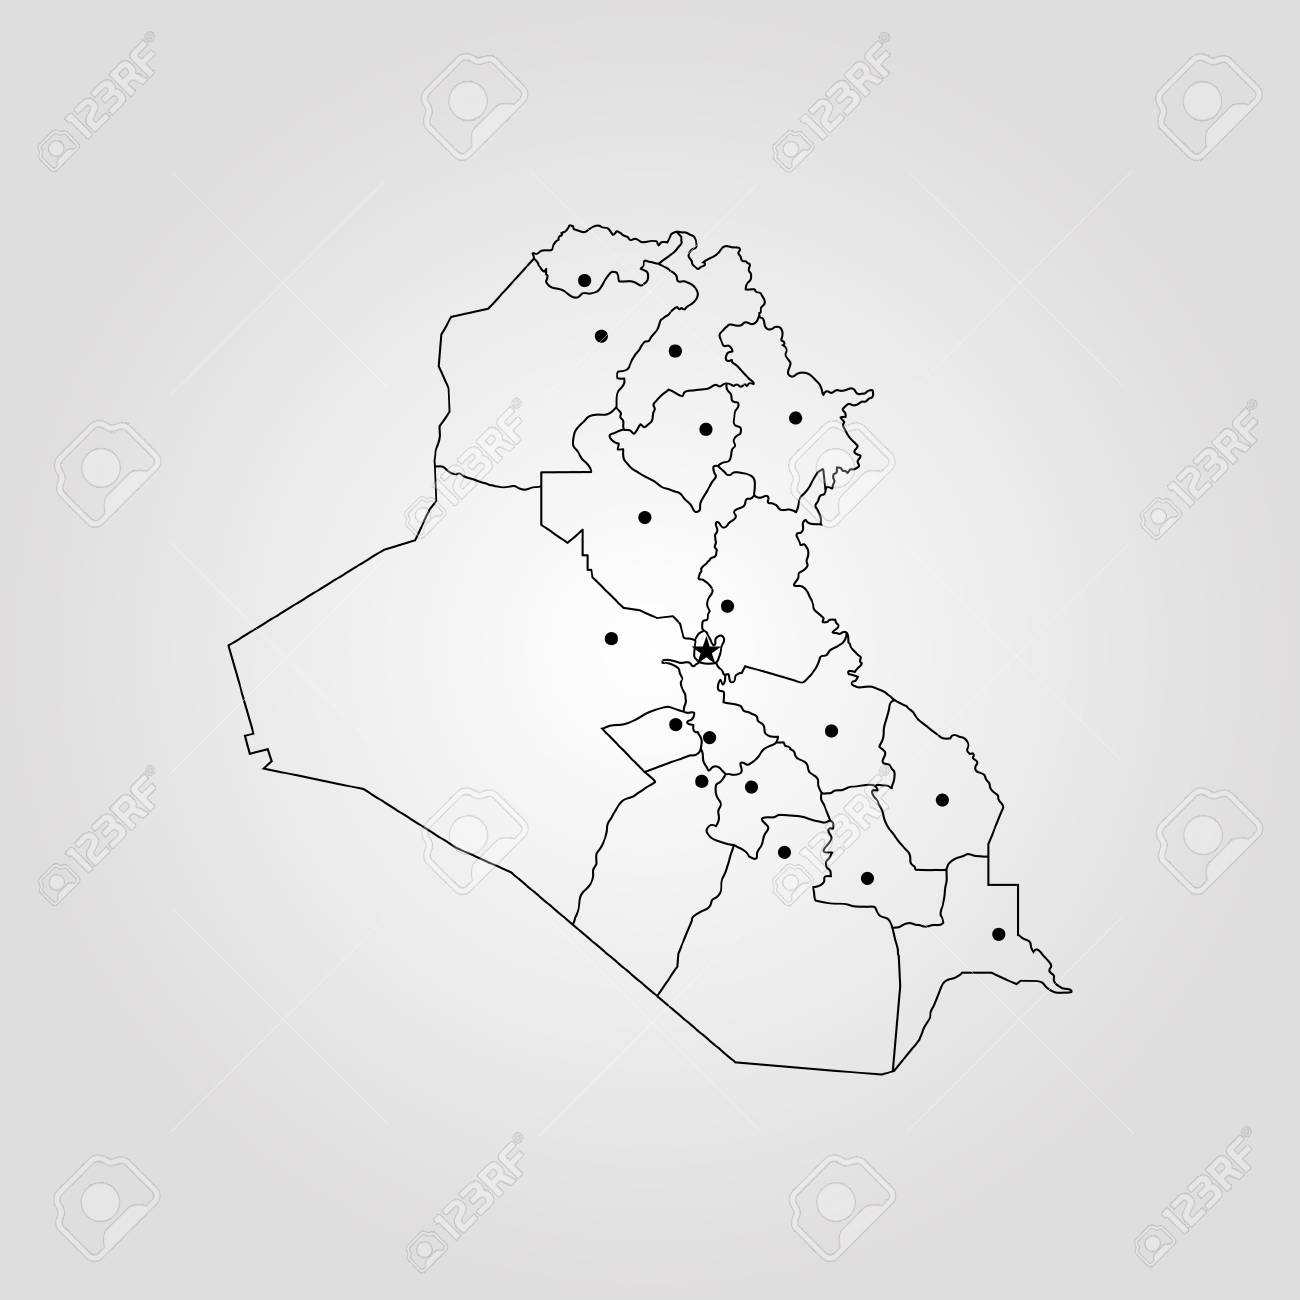 Map of Iraq. Vector illustration. World map